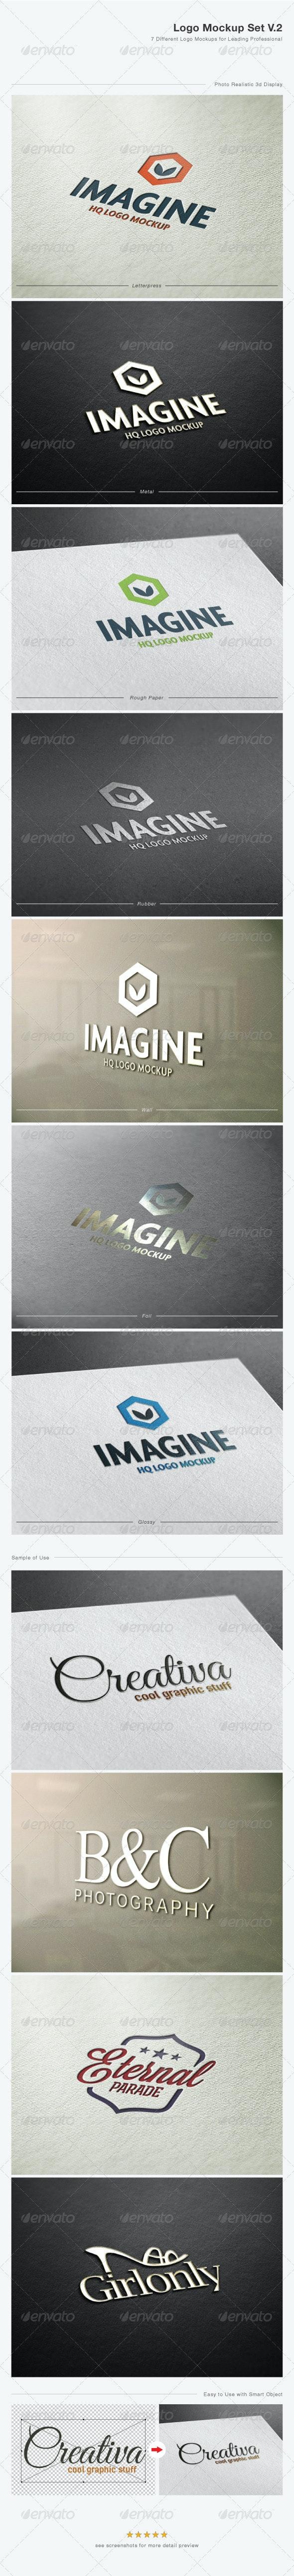 Logo Mock-Up Set V.2 - Logo Product Mock-Ups